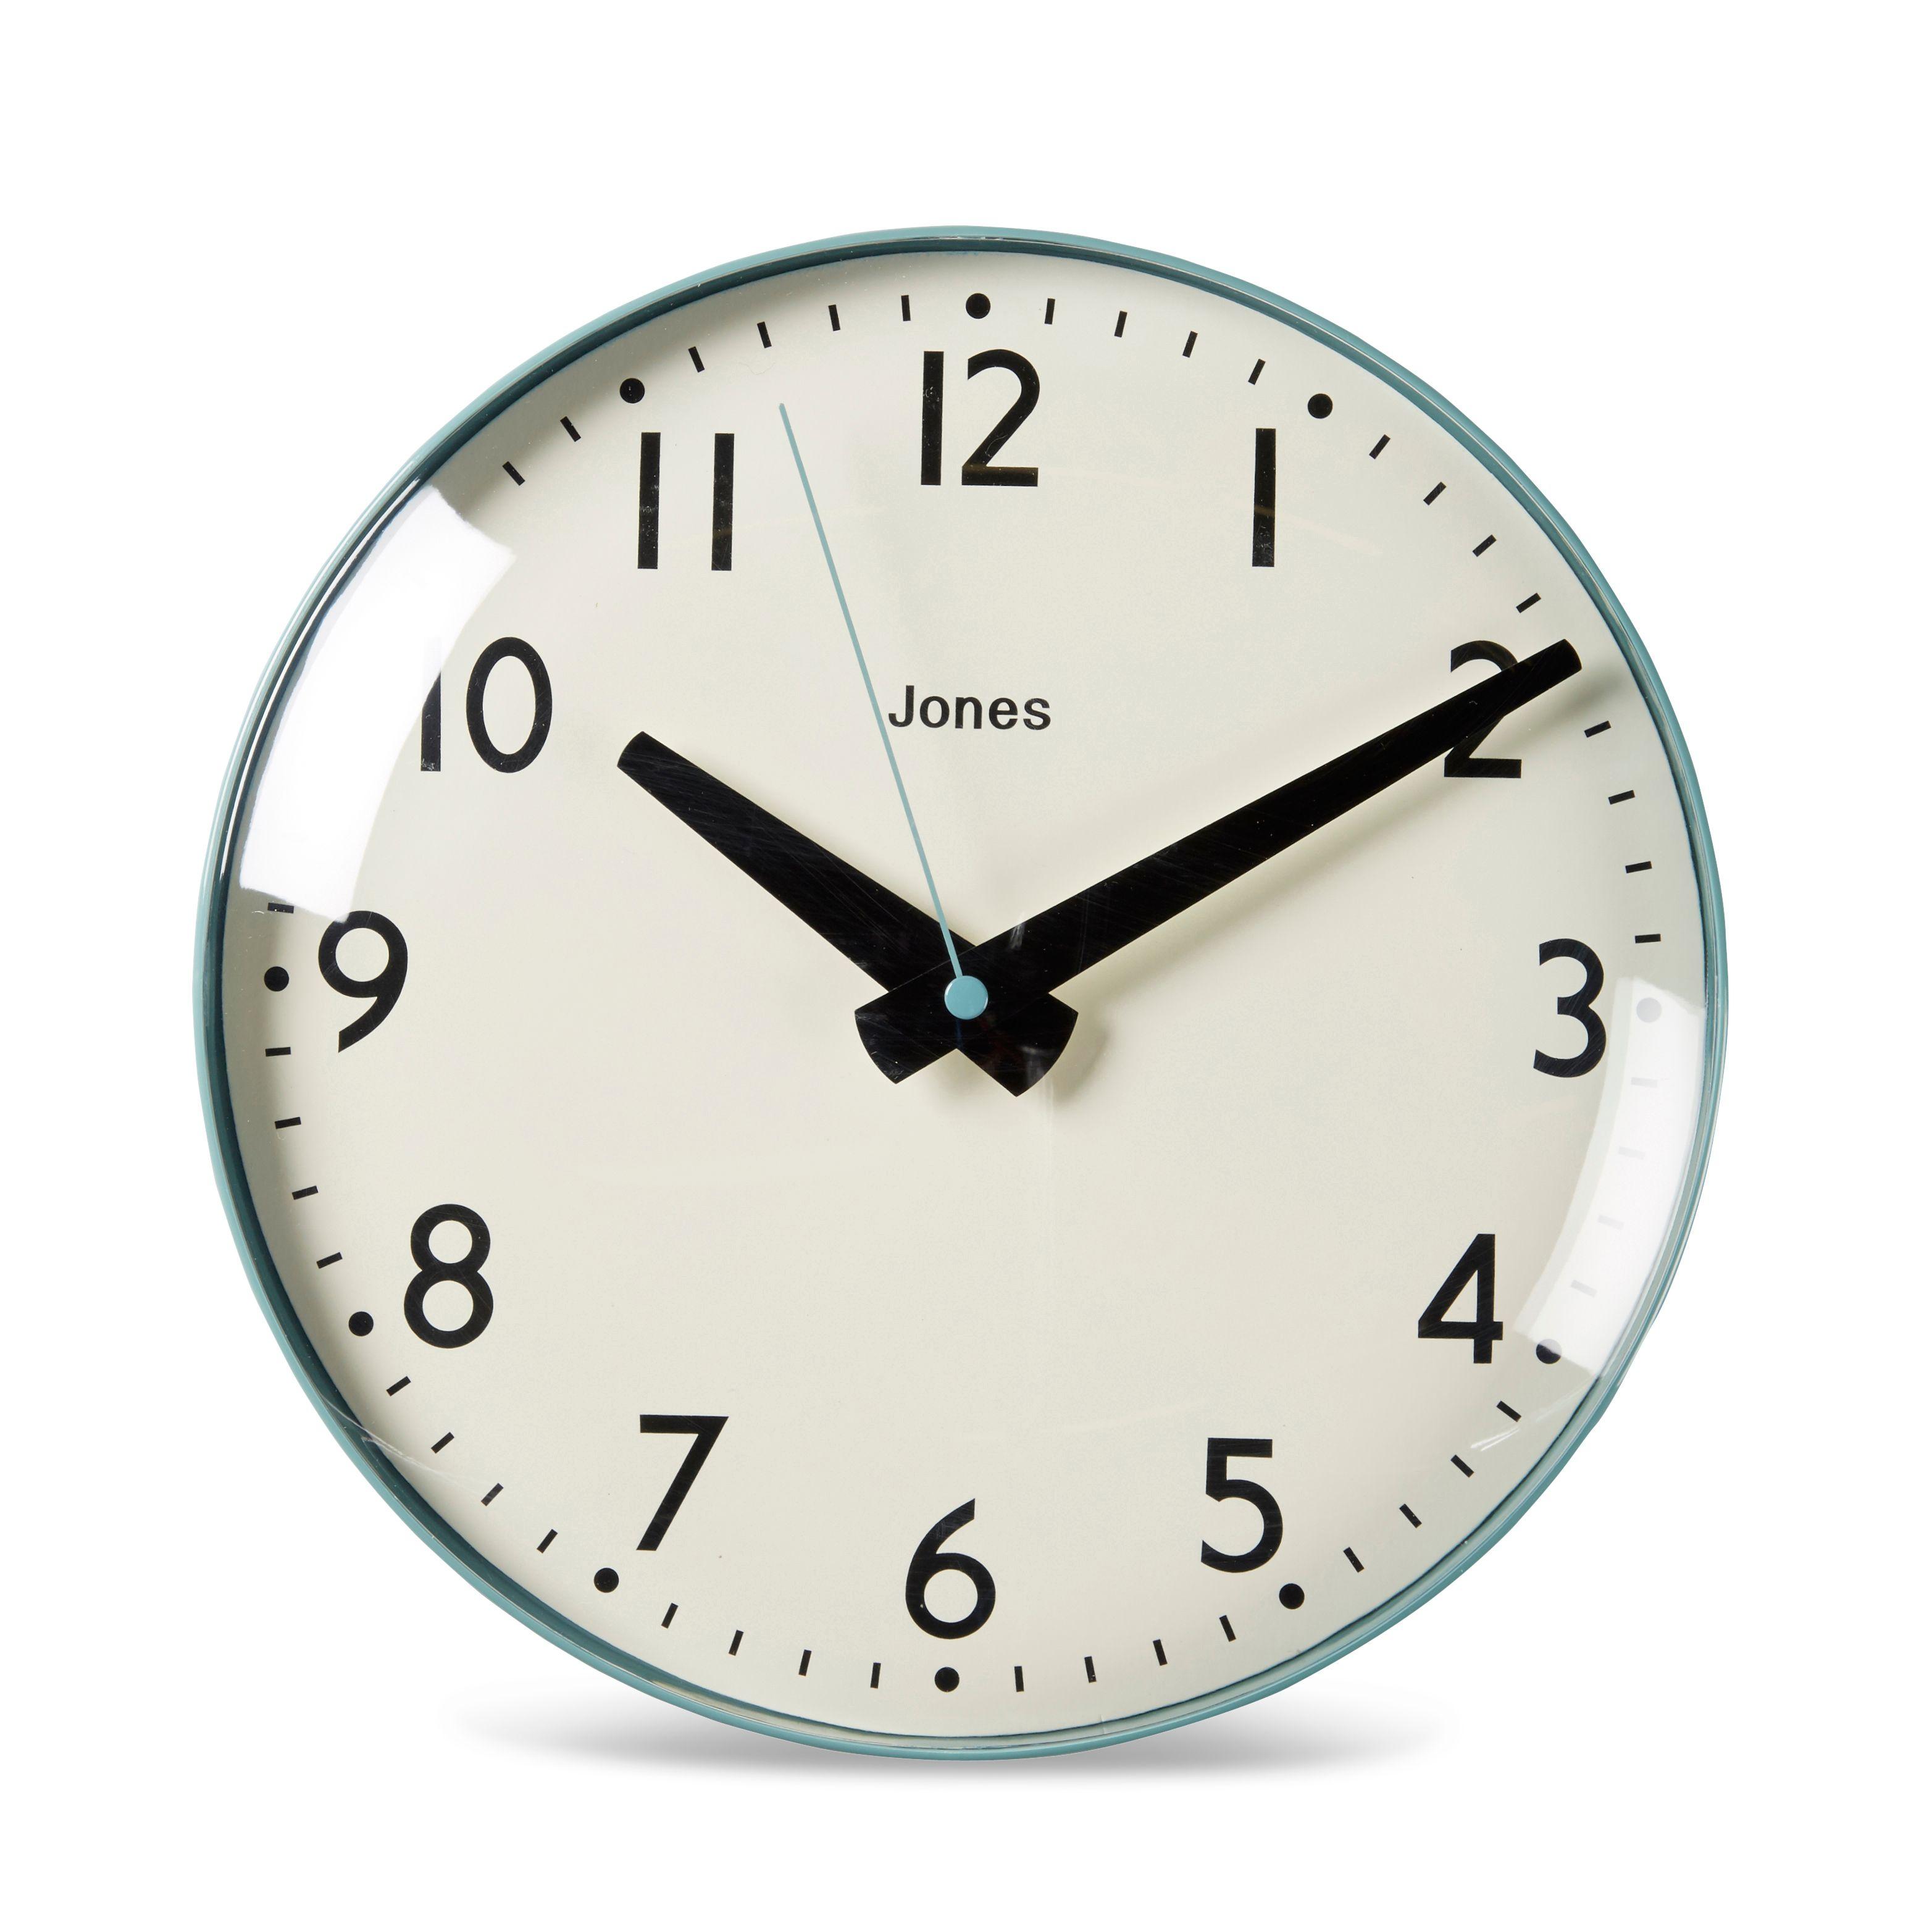 Jones Clocks Concorde Teal Analogue Clock | Departments | DIY at B&Q